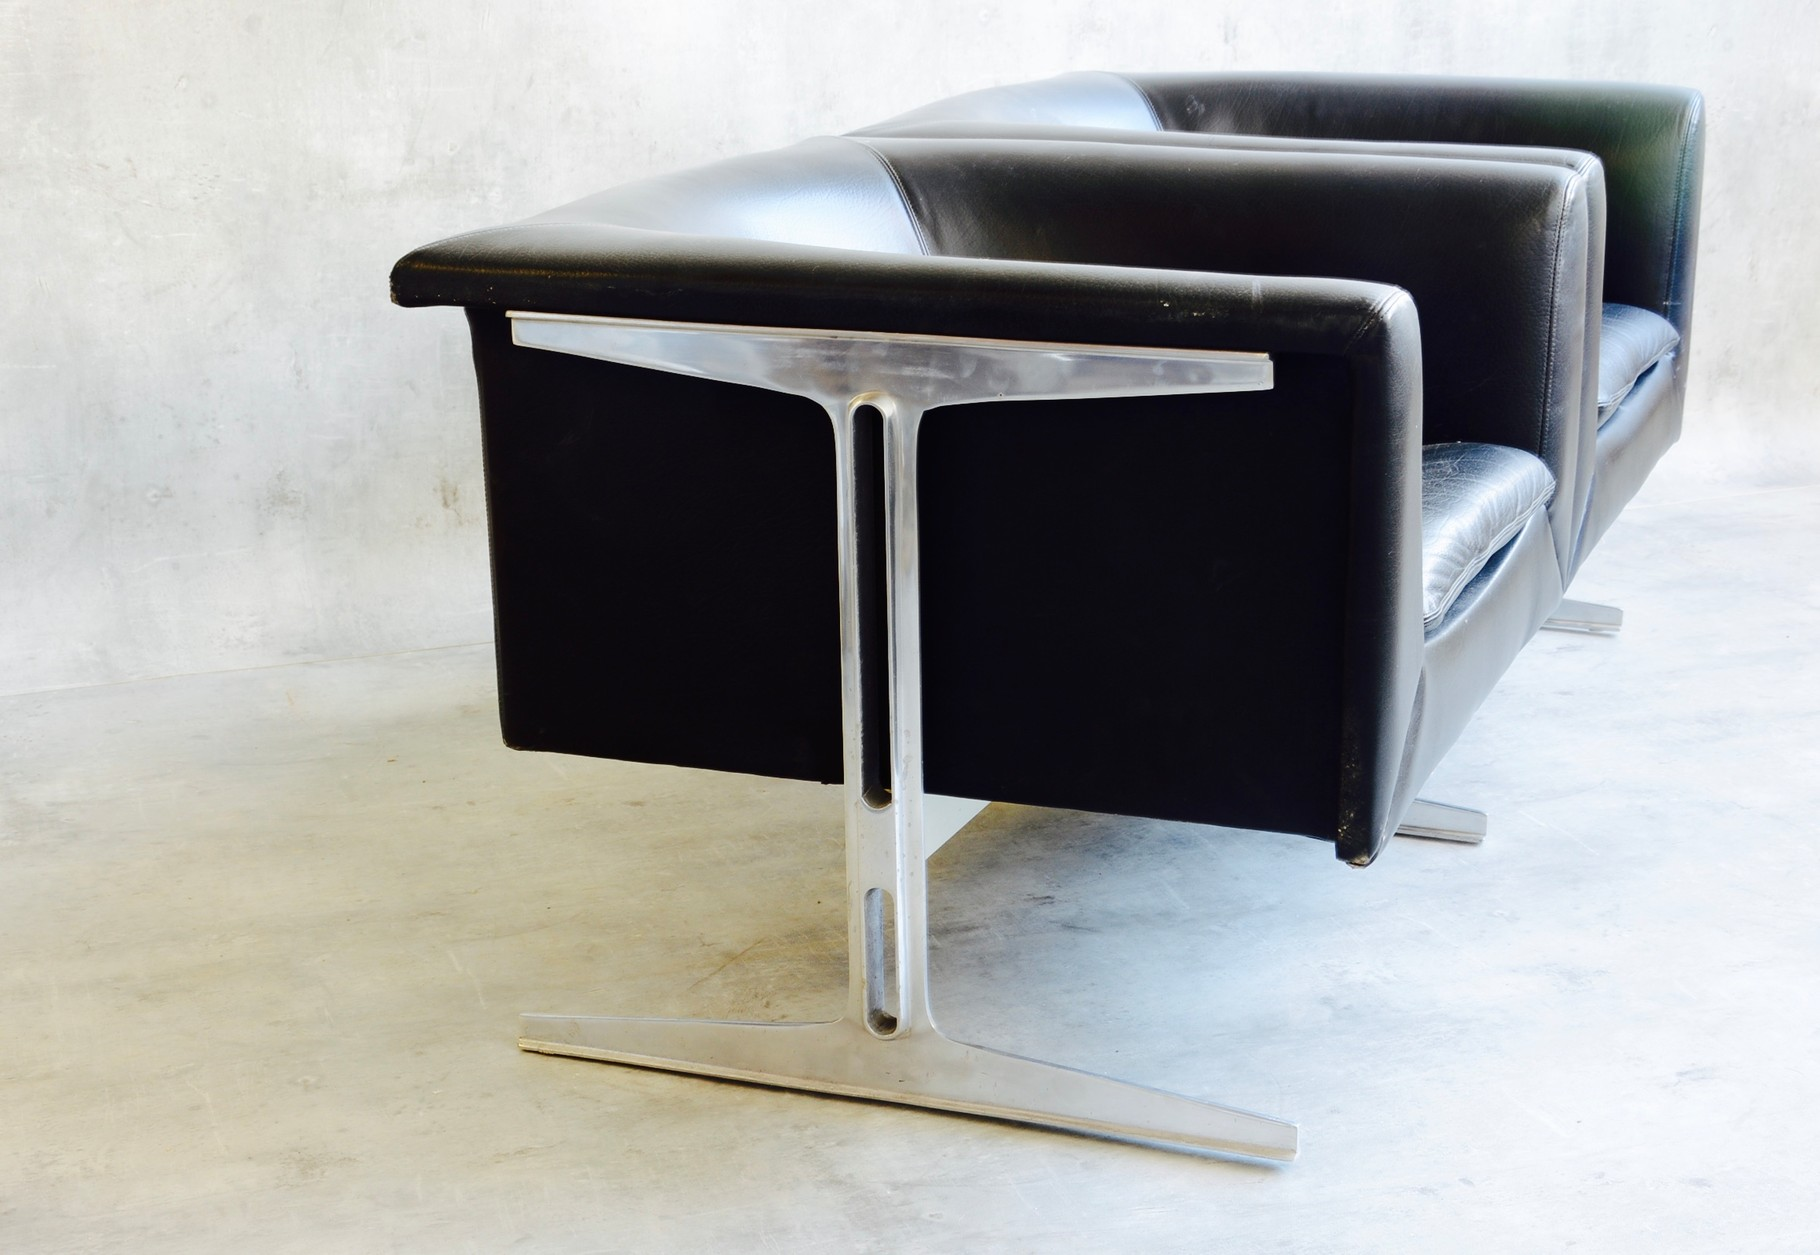 Esstisch Stühle Grau Stoff Rheumricom Design Armsessel Armlehnstuhle ...